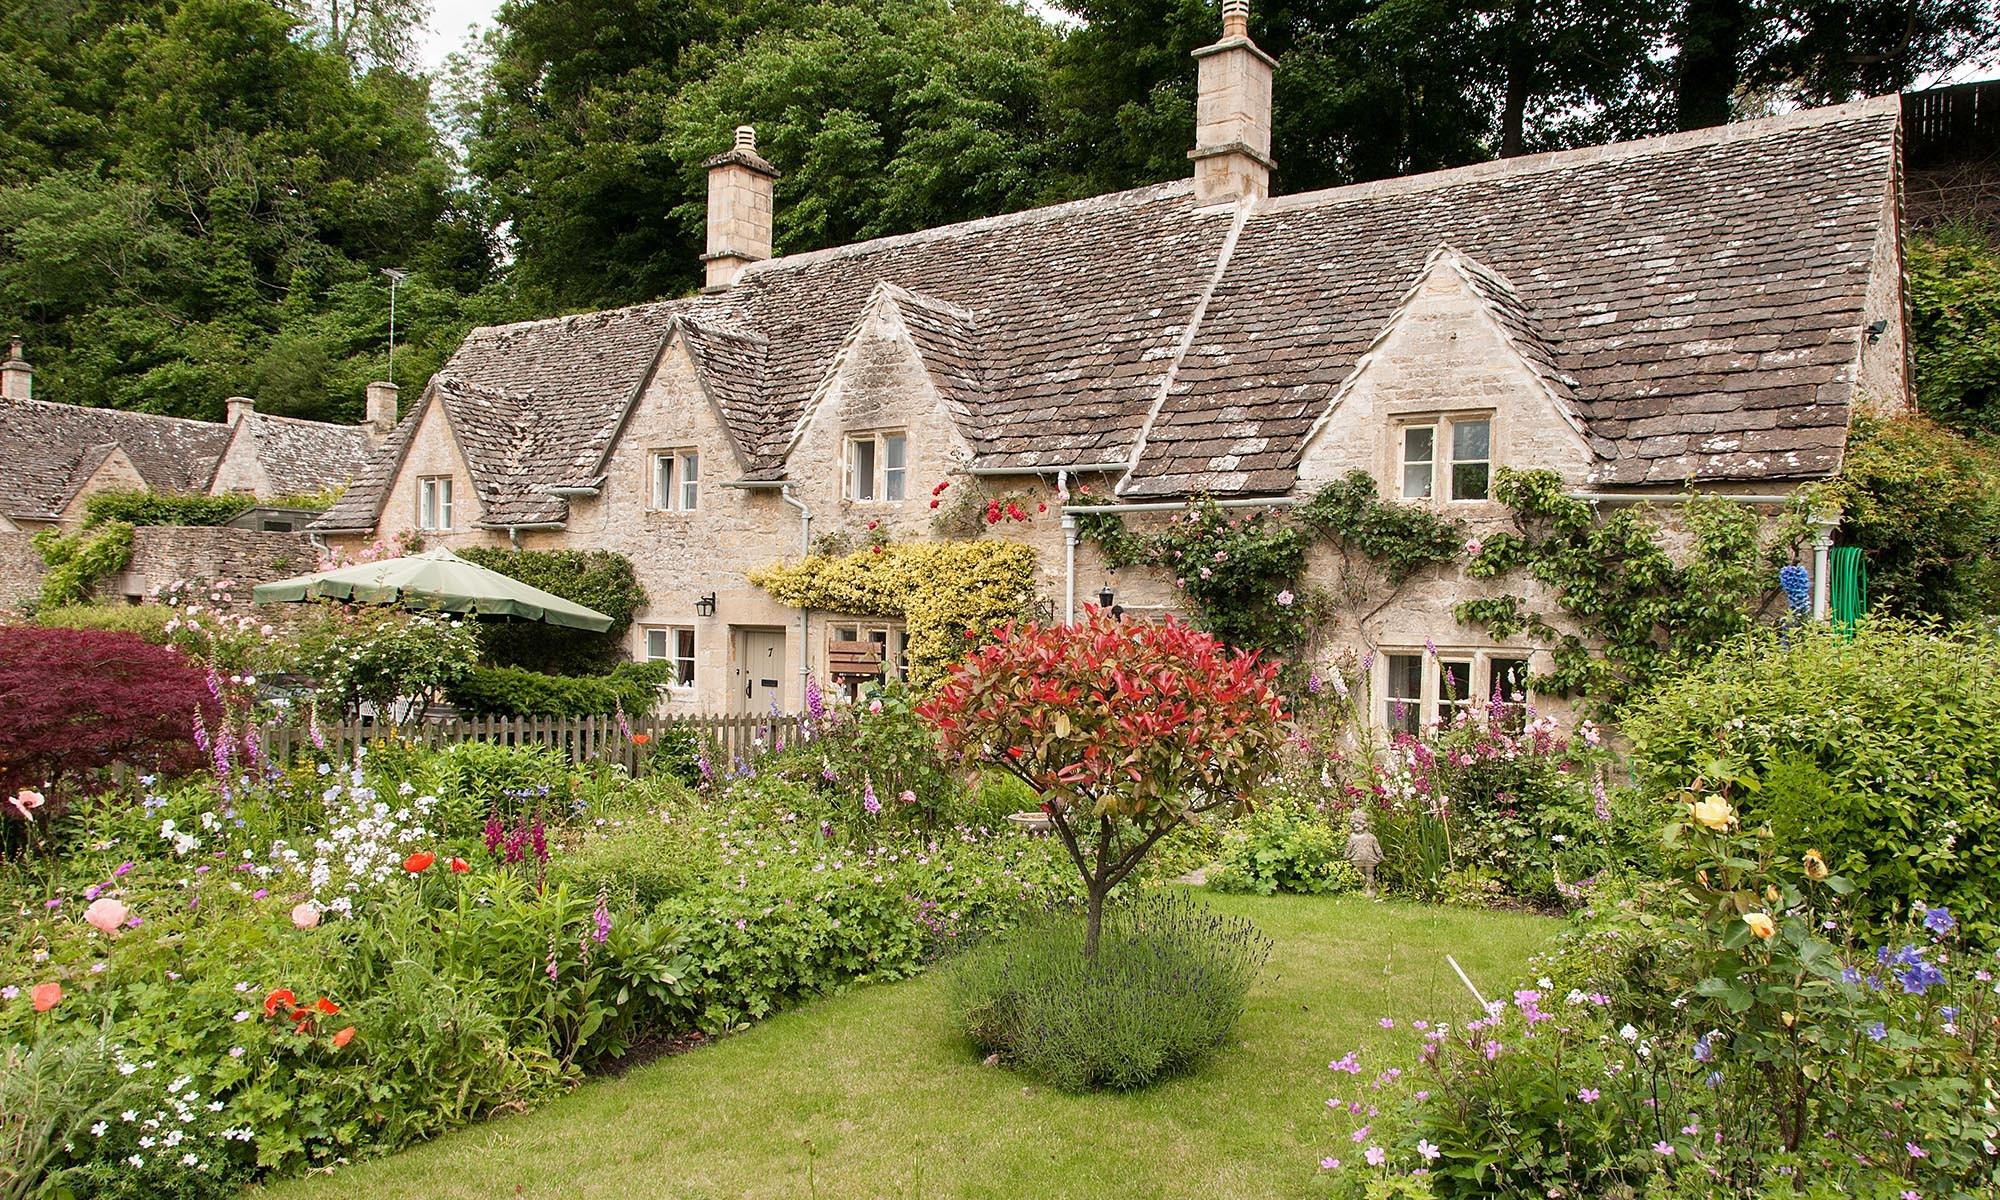 English Cottage at Bilbury